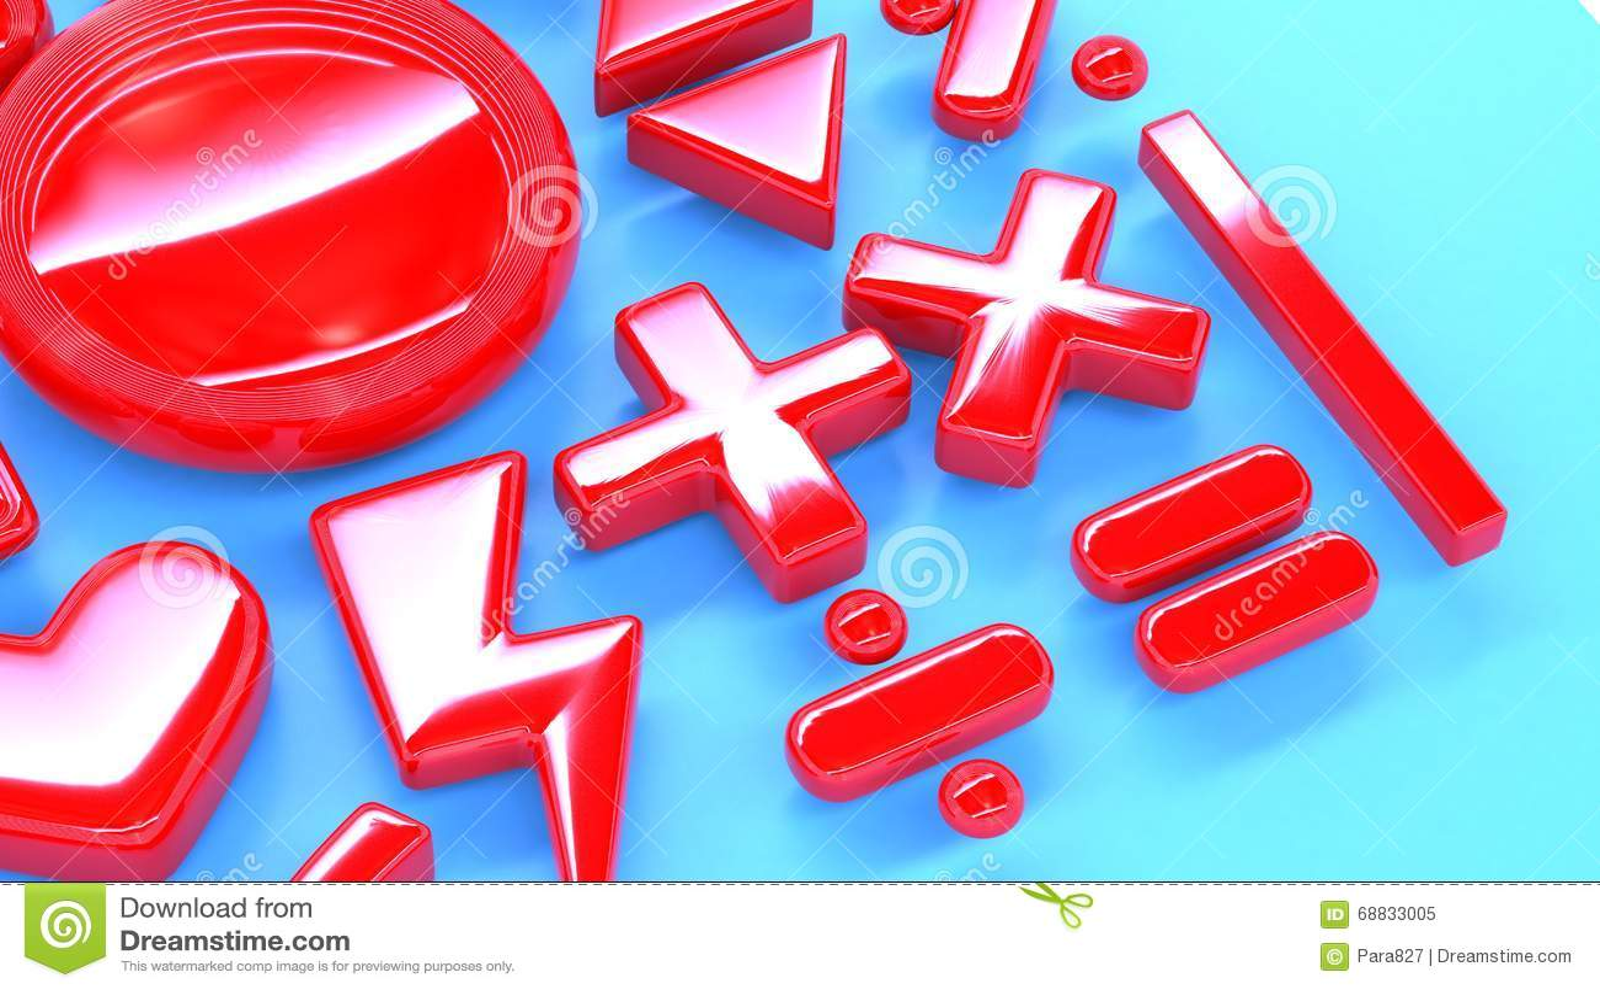 Math Symbols Illustration 68833005 Megapixl